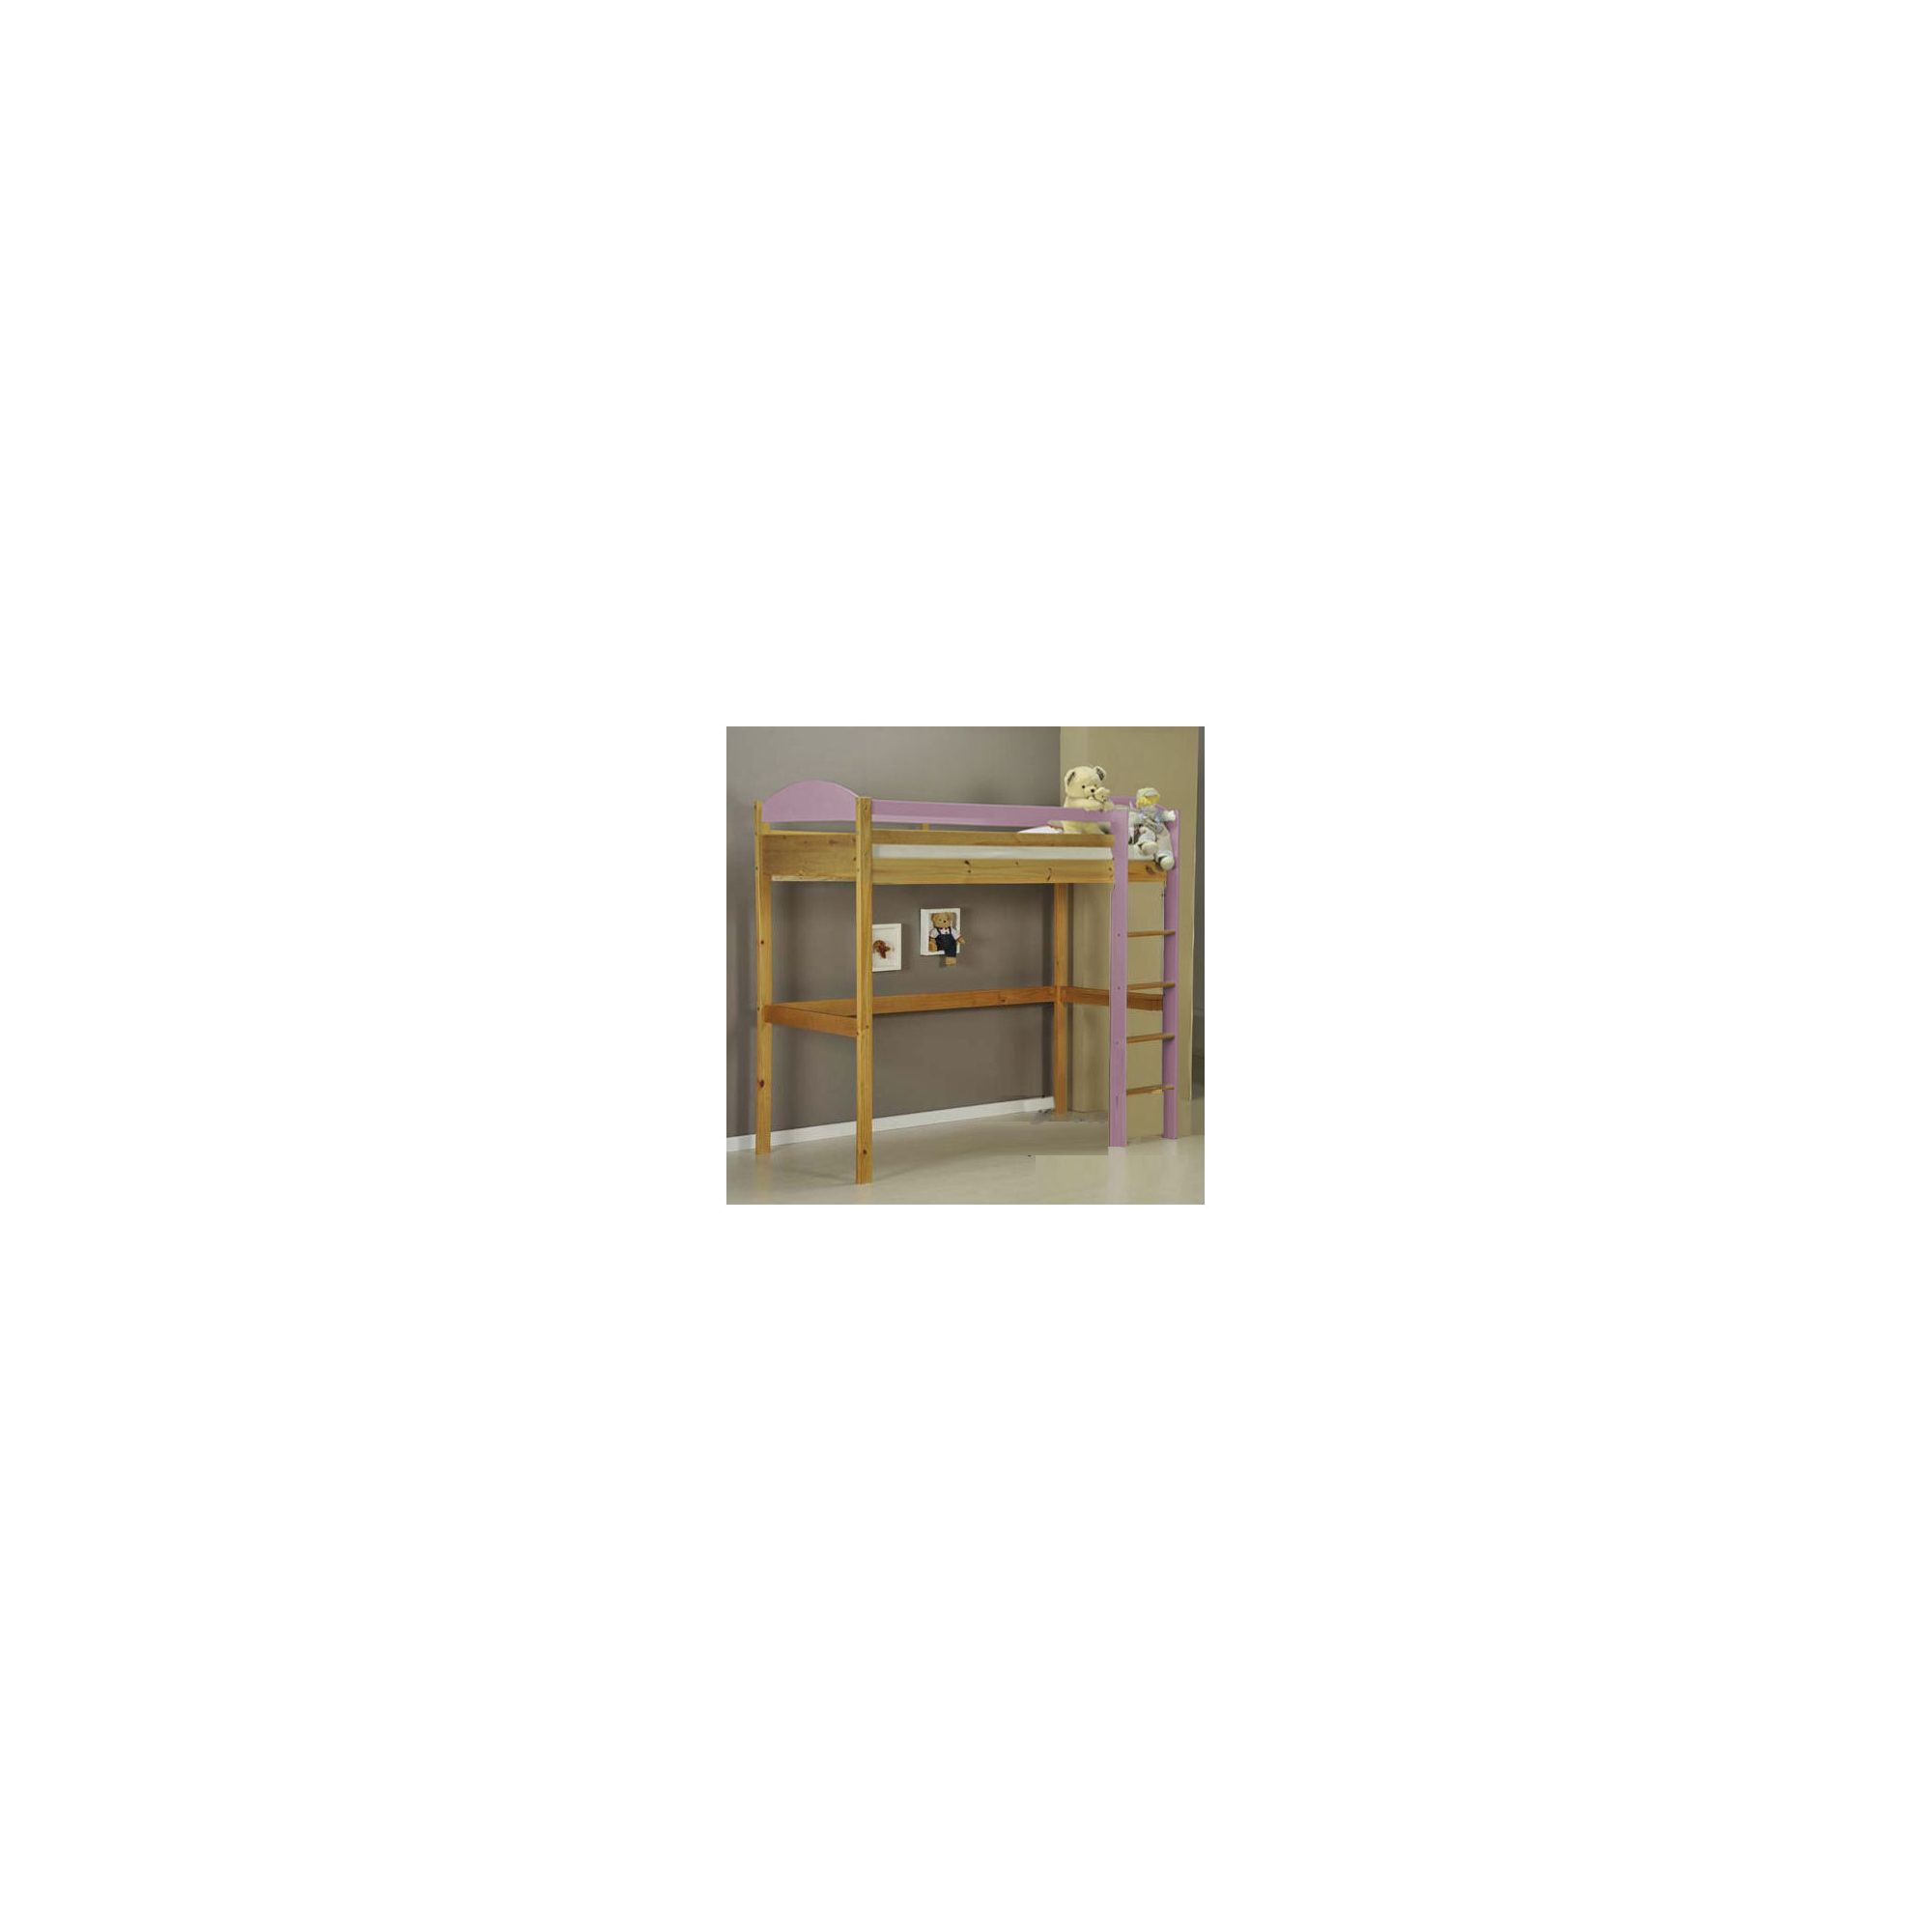 Verona Maximus Highsleeper Bed Frame - Pink at Tesco Direct